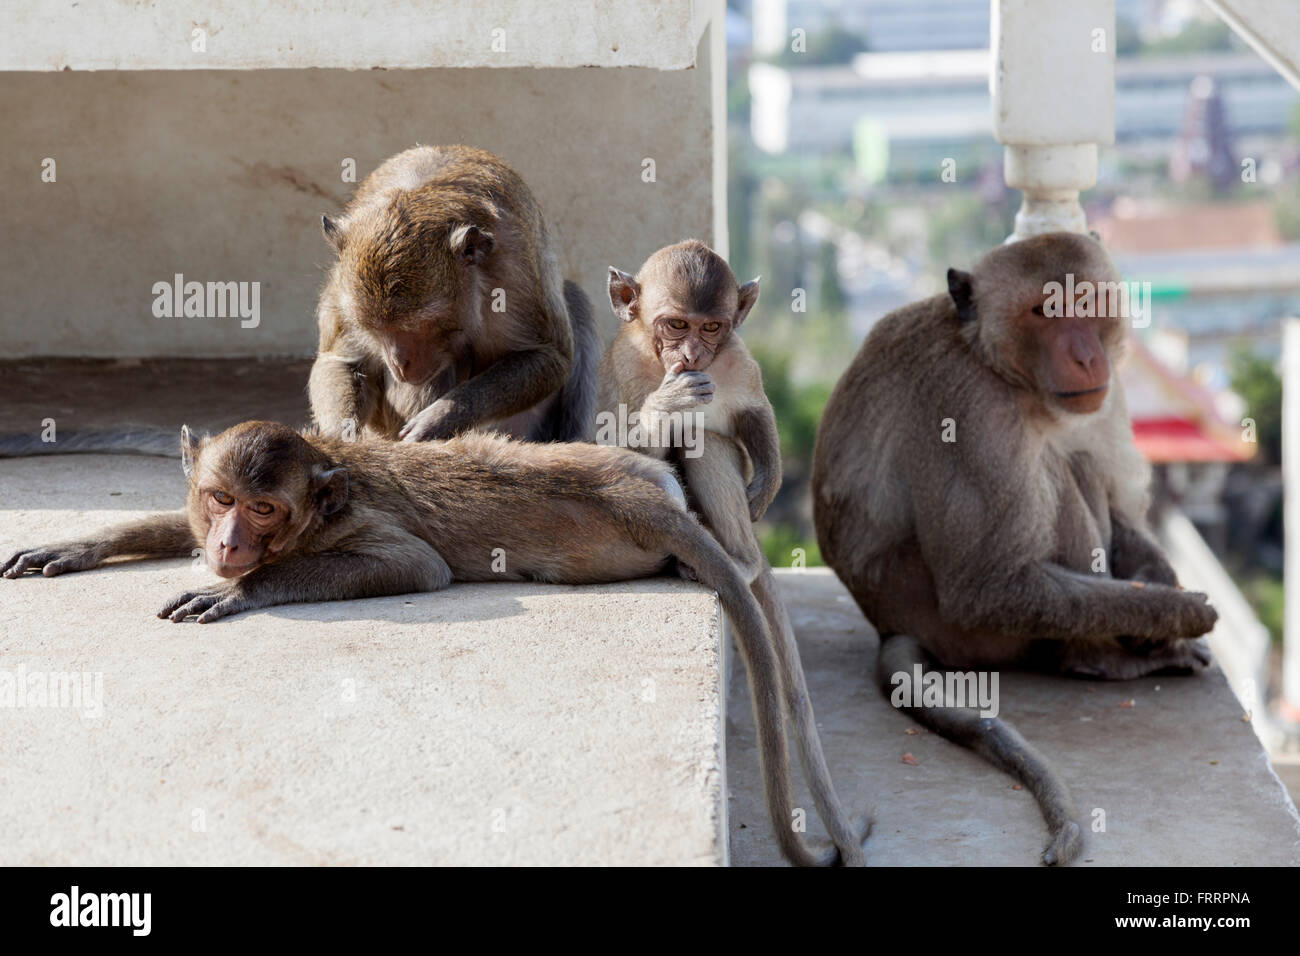 A delouse session amongst macaques in the Thammikaram temple, at Prachuap Khiri Khan (Thailand). Séance d'épouillage. - Stock Image